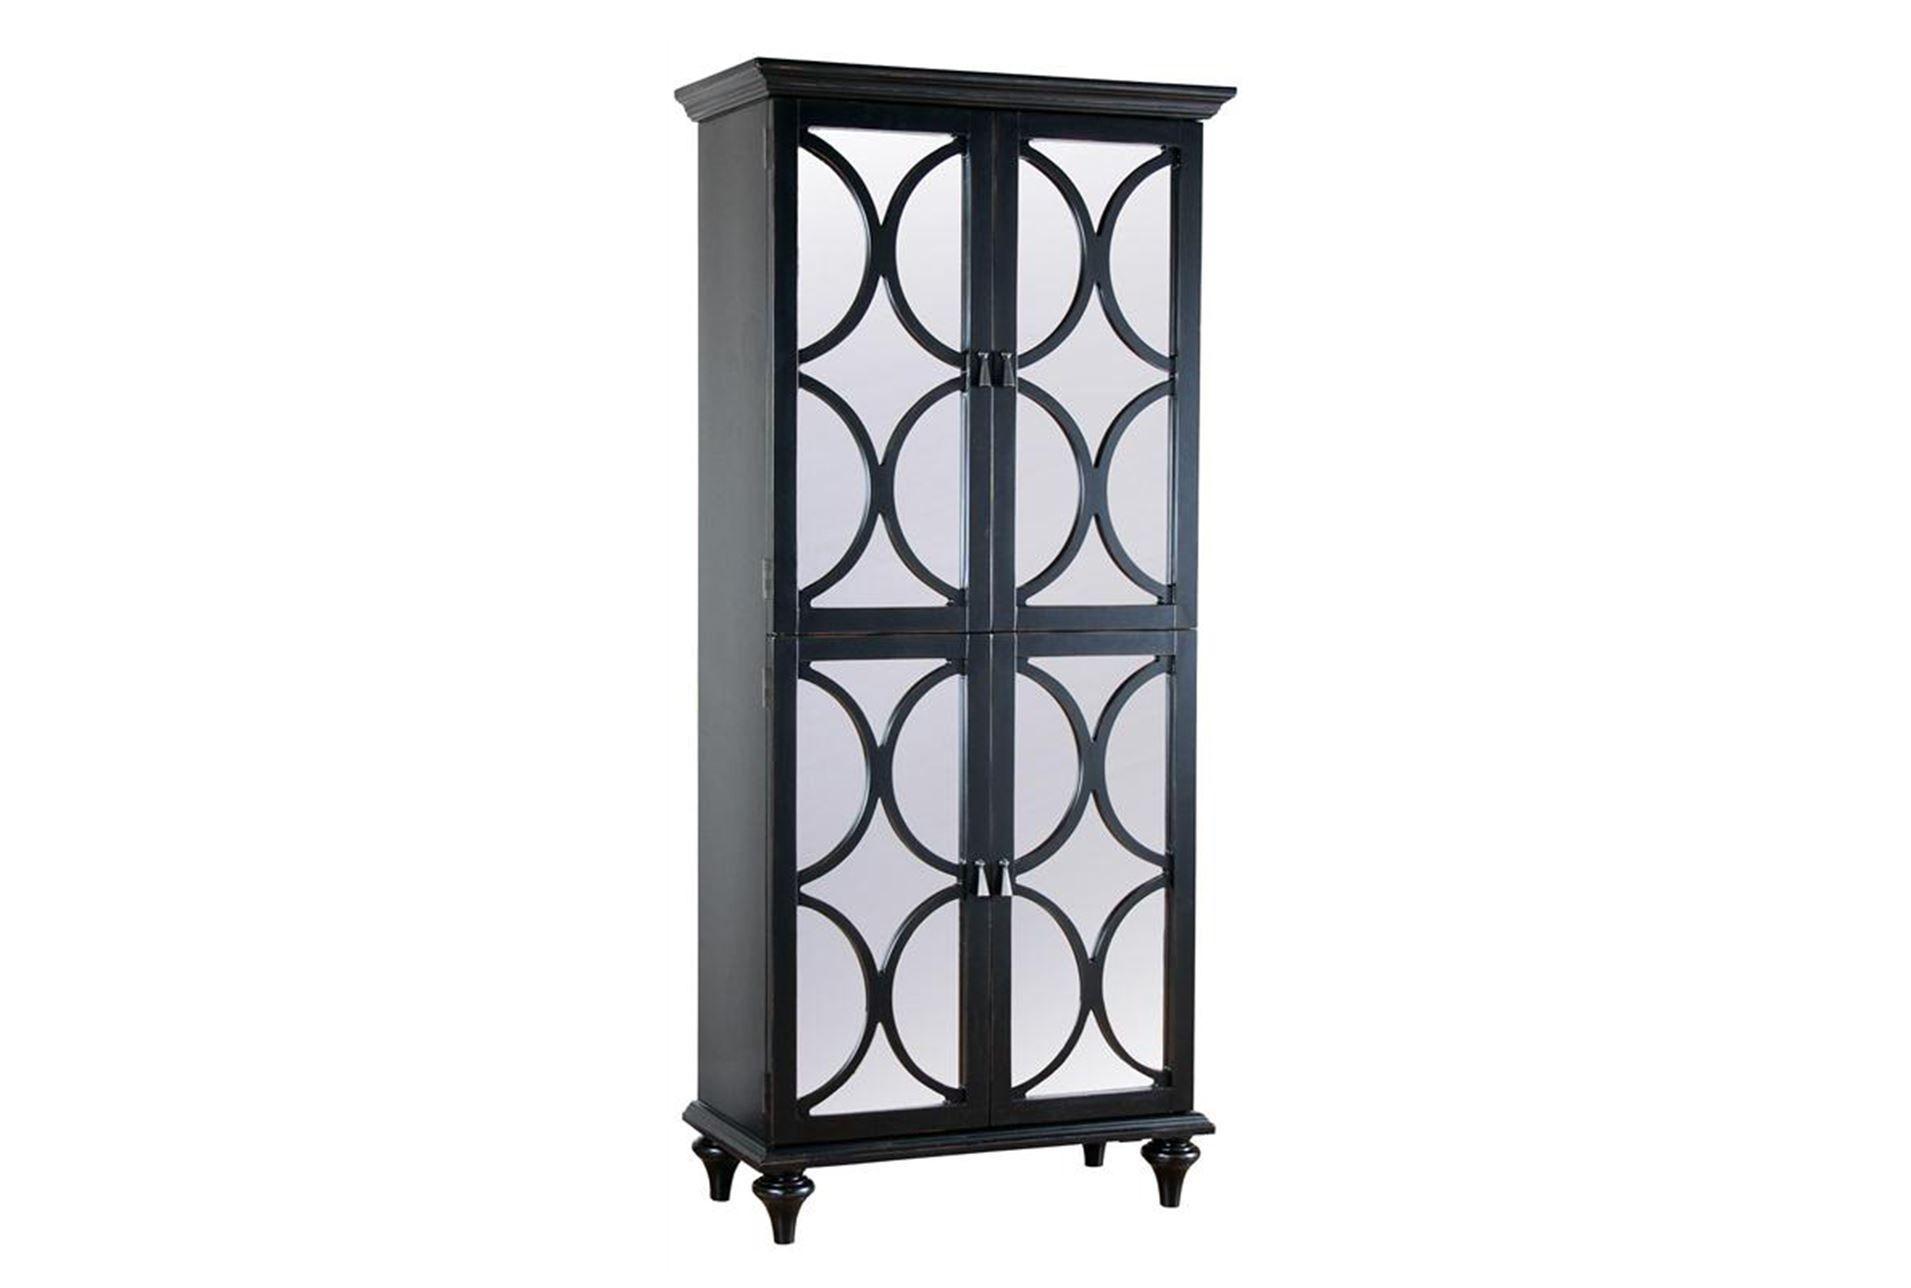 Otb Bristol Tall Bar Cabinet | Ideas for the House | Pinterest ...